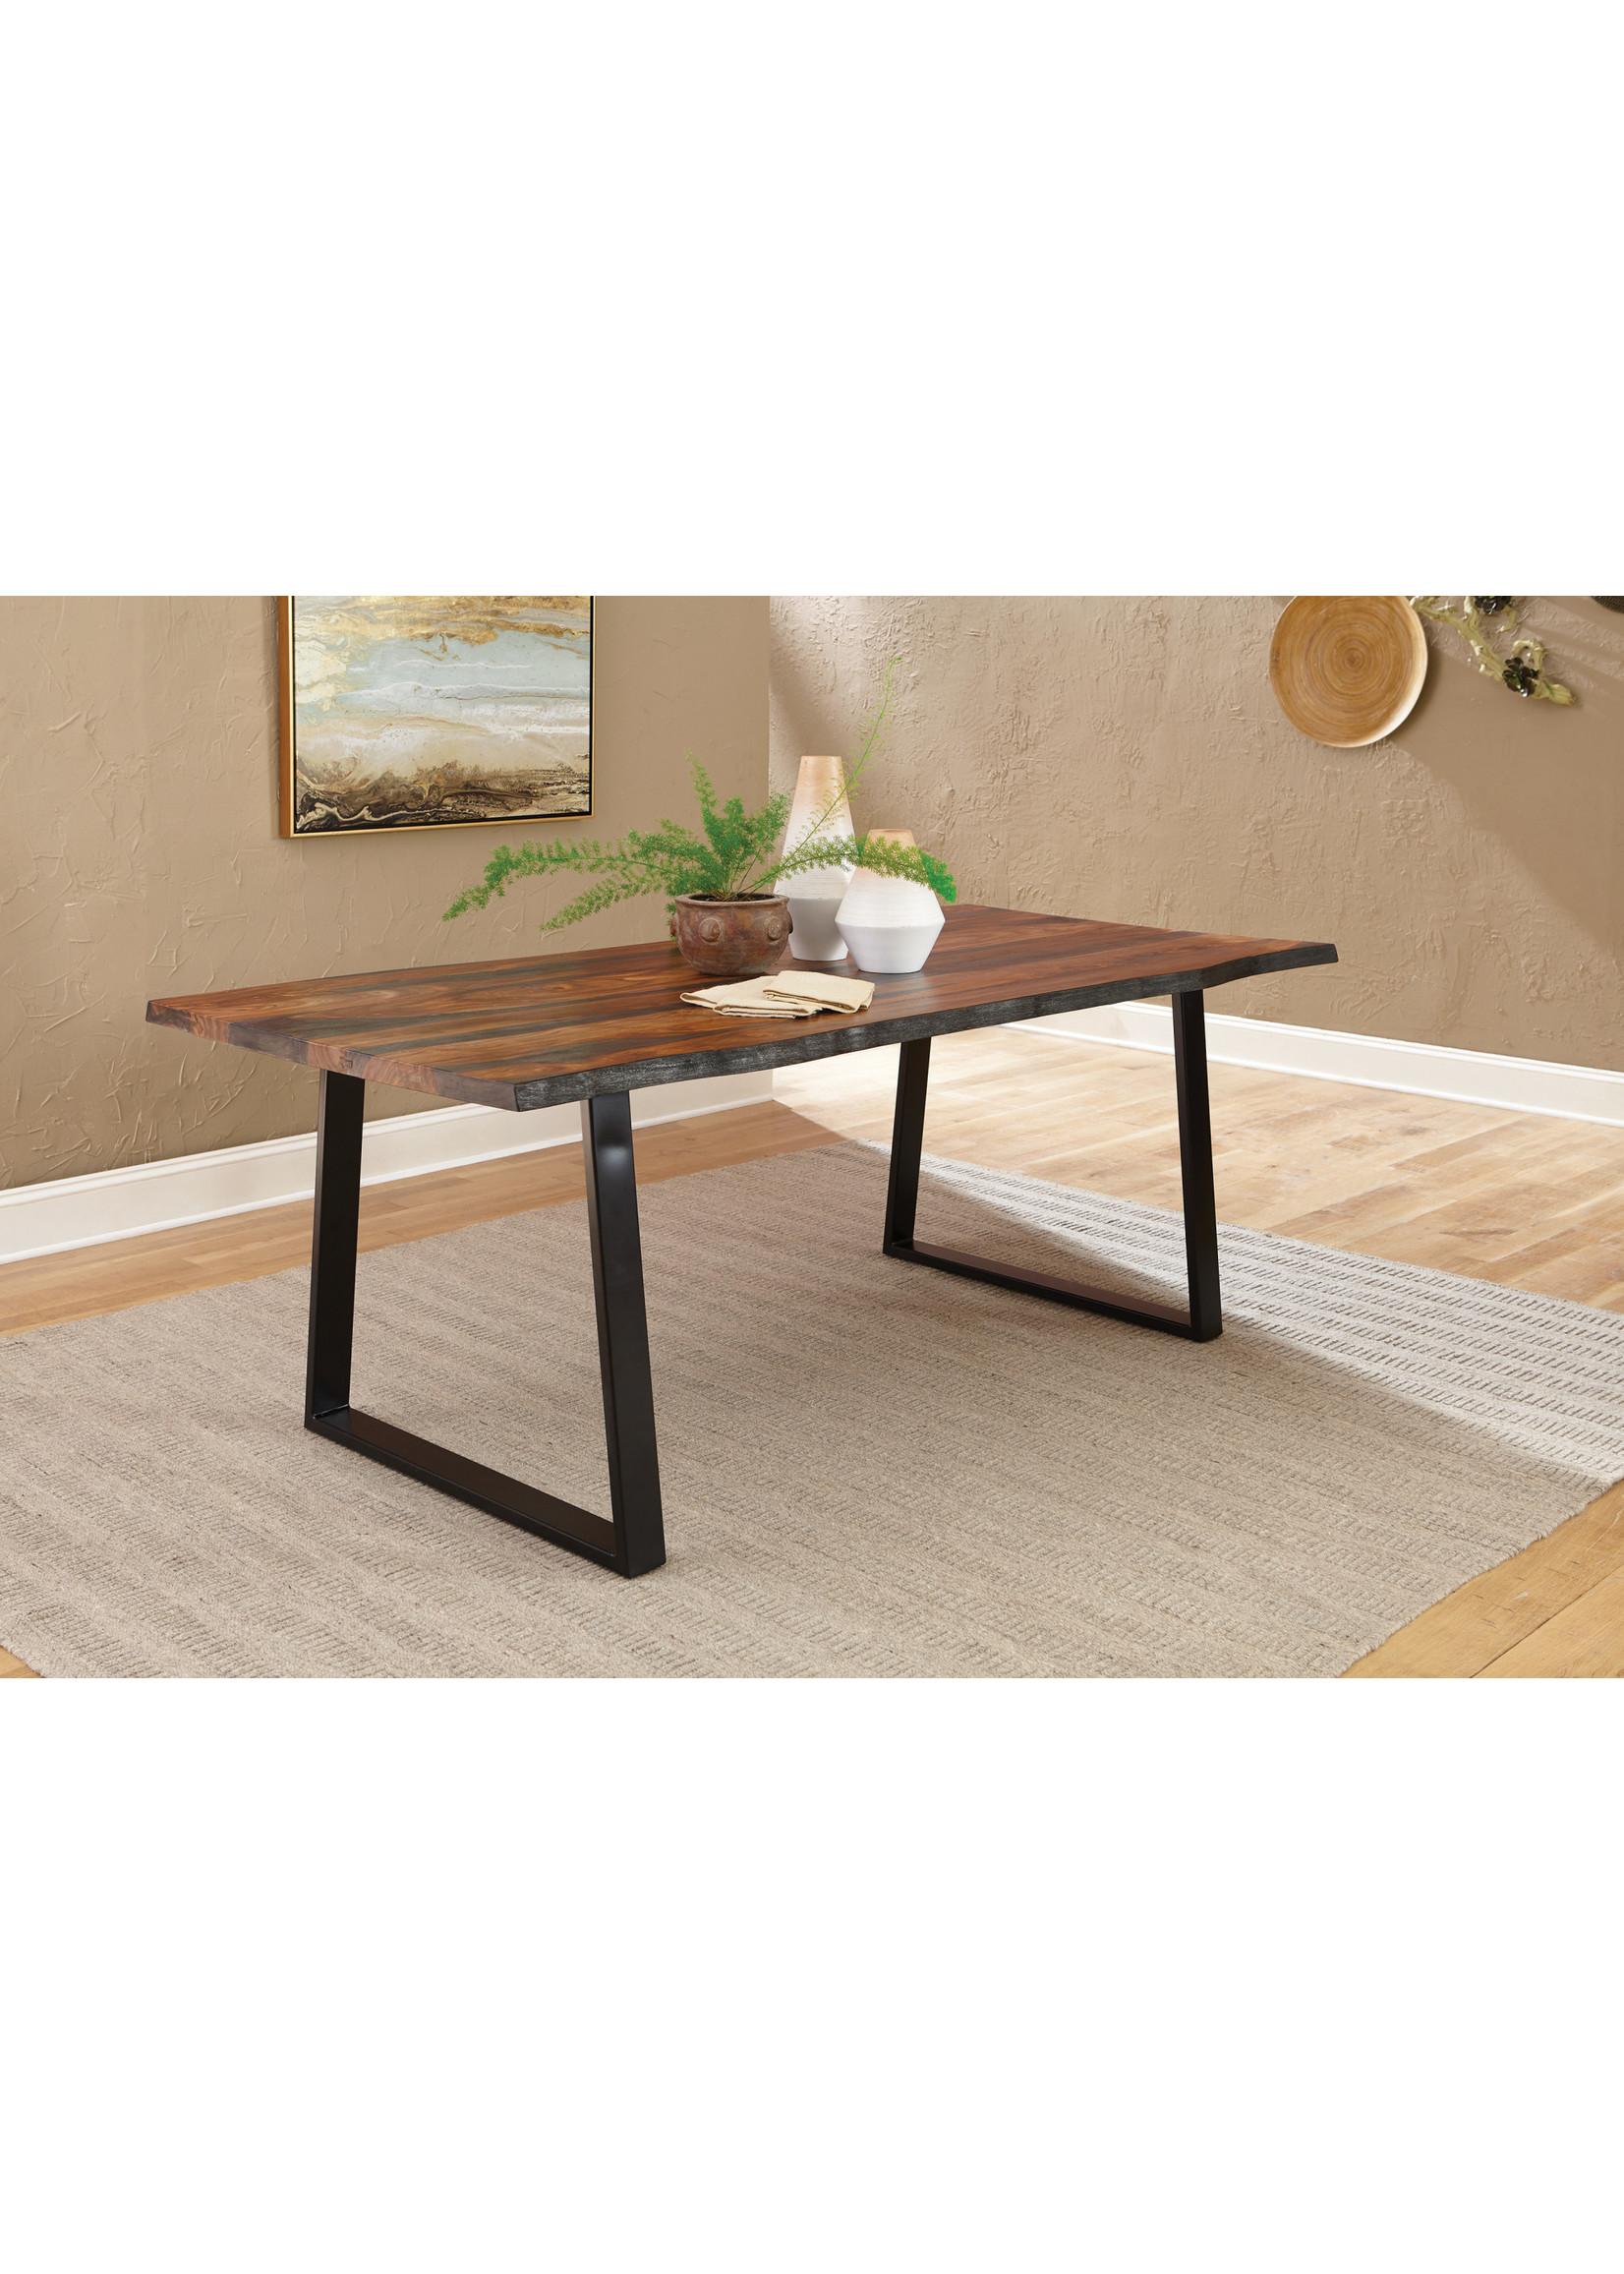 Coaster Furniture Dining Table Grey Sheesham by Coaster